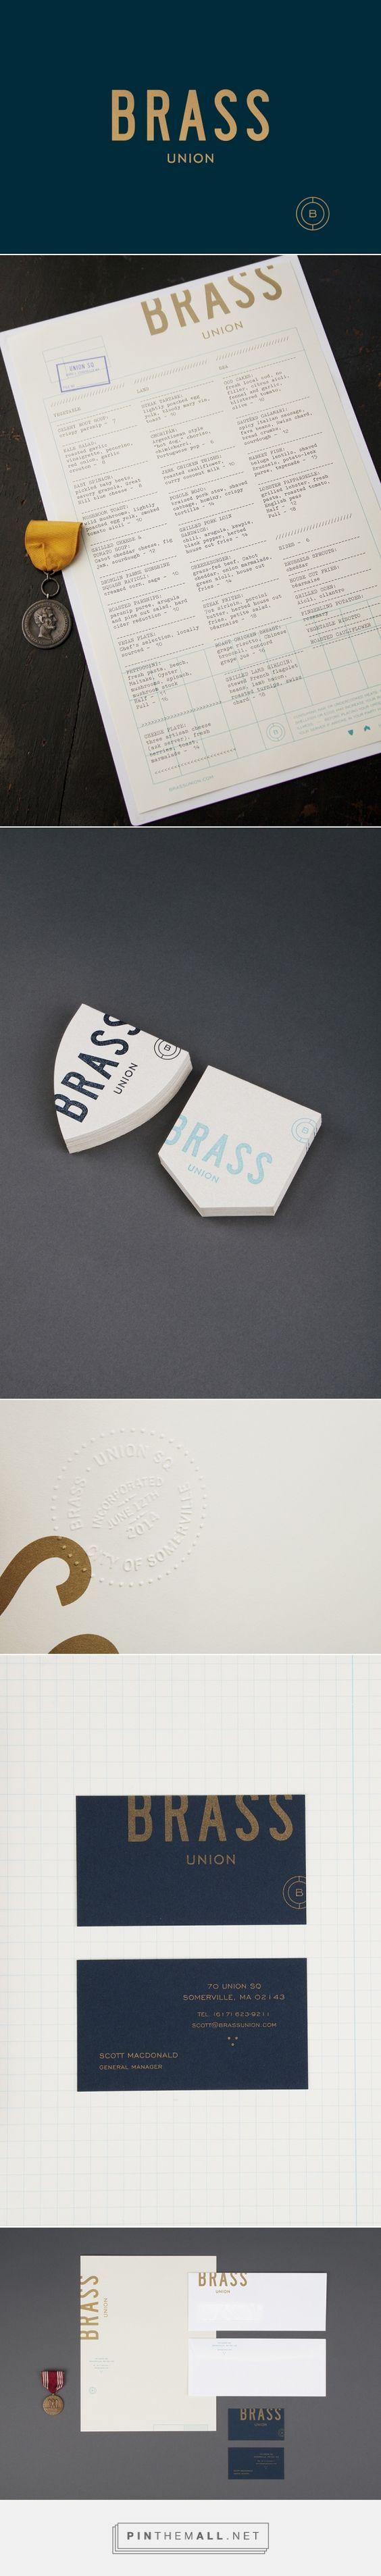 Brass Union Branding by Oat | Fivestar Branding – Design and Branding Agency & Inspiration Gallery